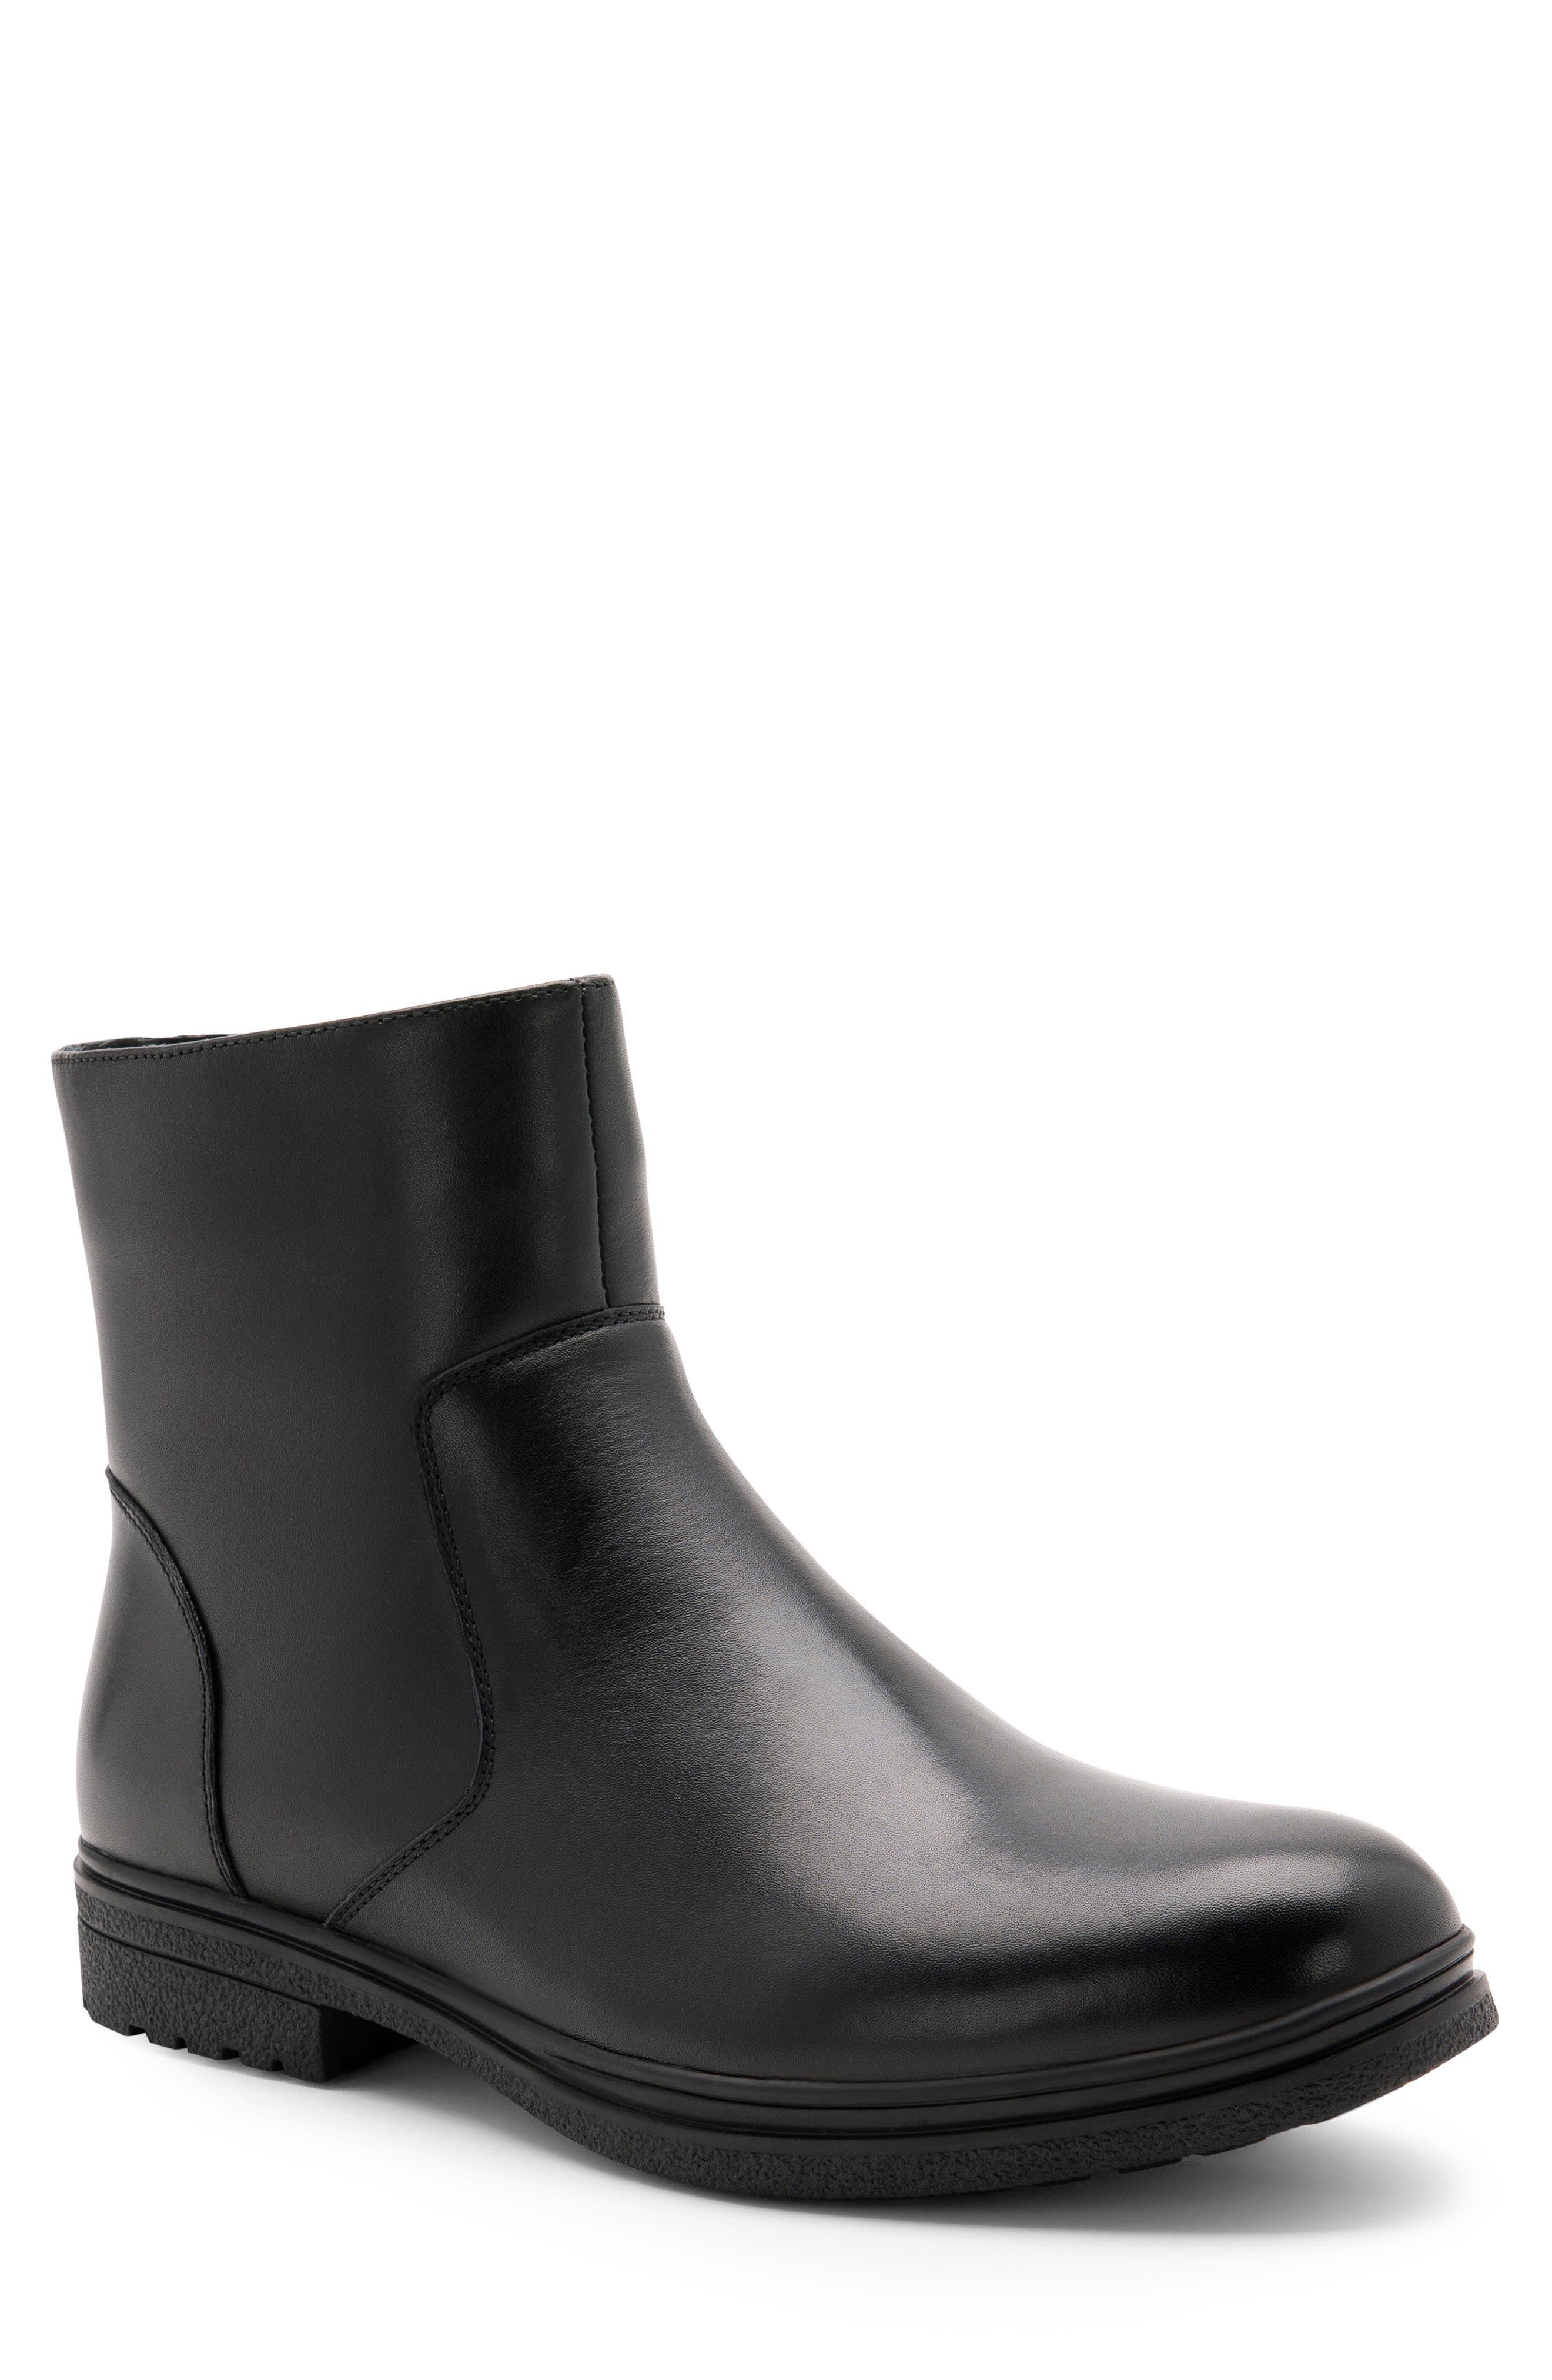 Blondo Sylvio Waterproof Zip Boot, Black